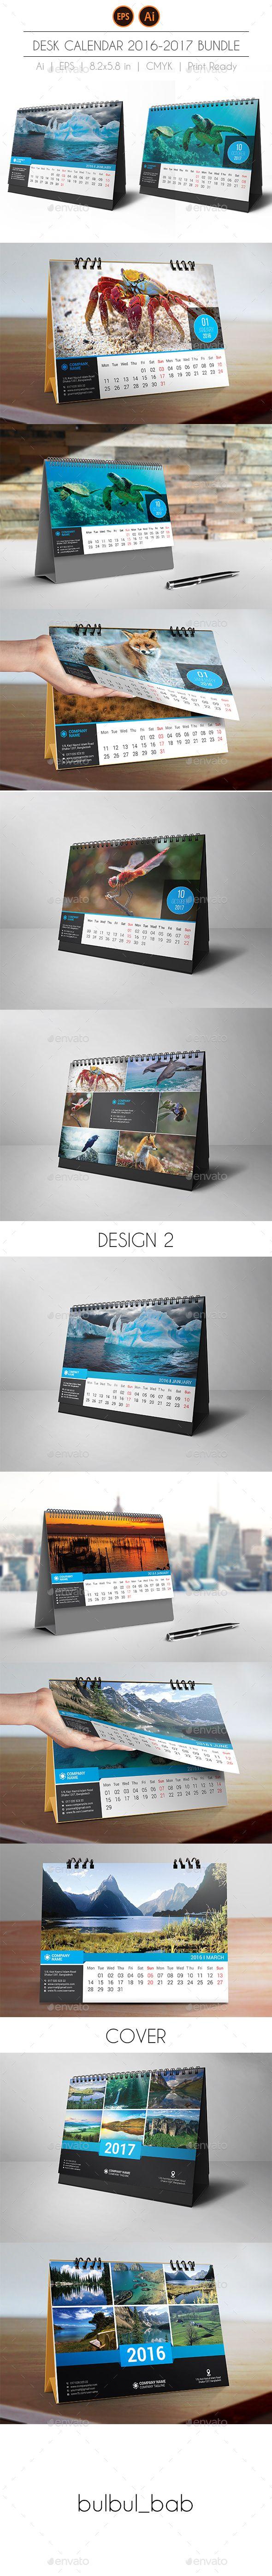 Desk Calendar 2017 Bundle Template Vector EPS, AI Illustrator. Download here: https://graphicriver.net/item/desk-calendar-2017-bundle/16653601?ref=ksioks